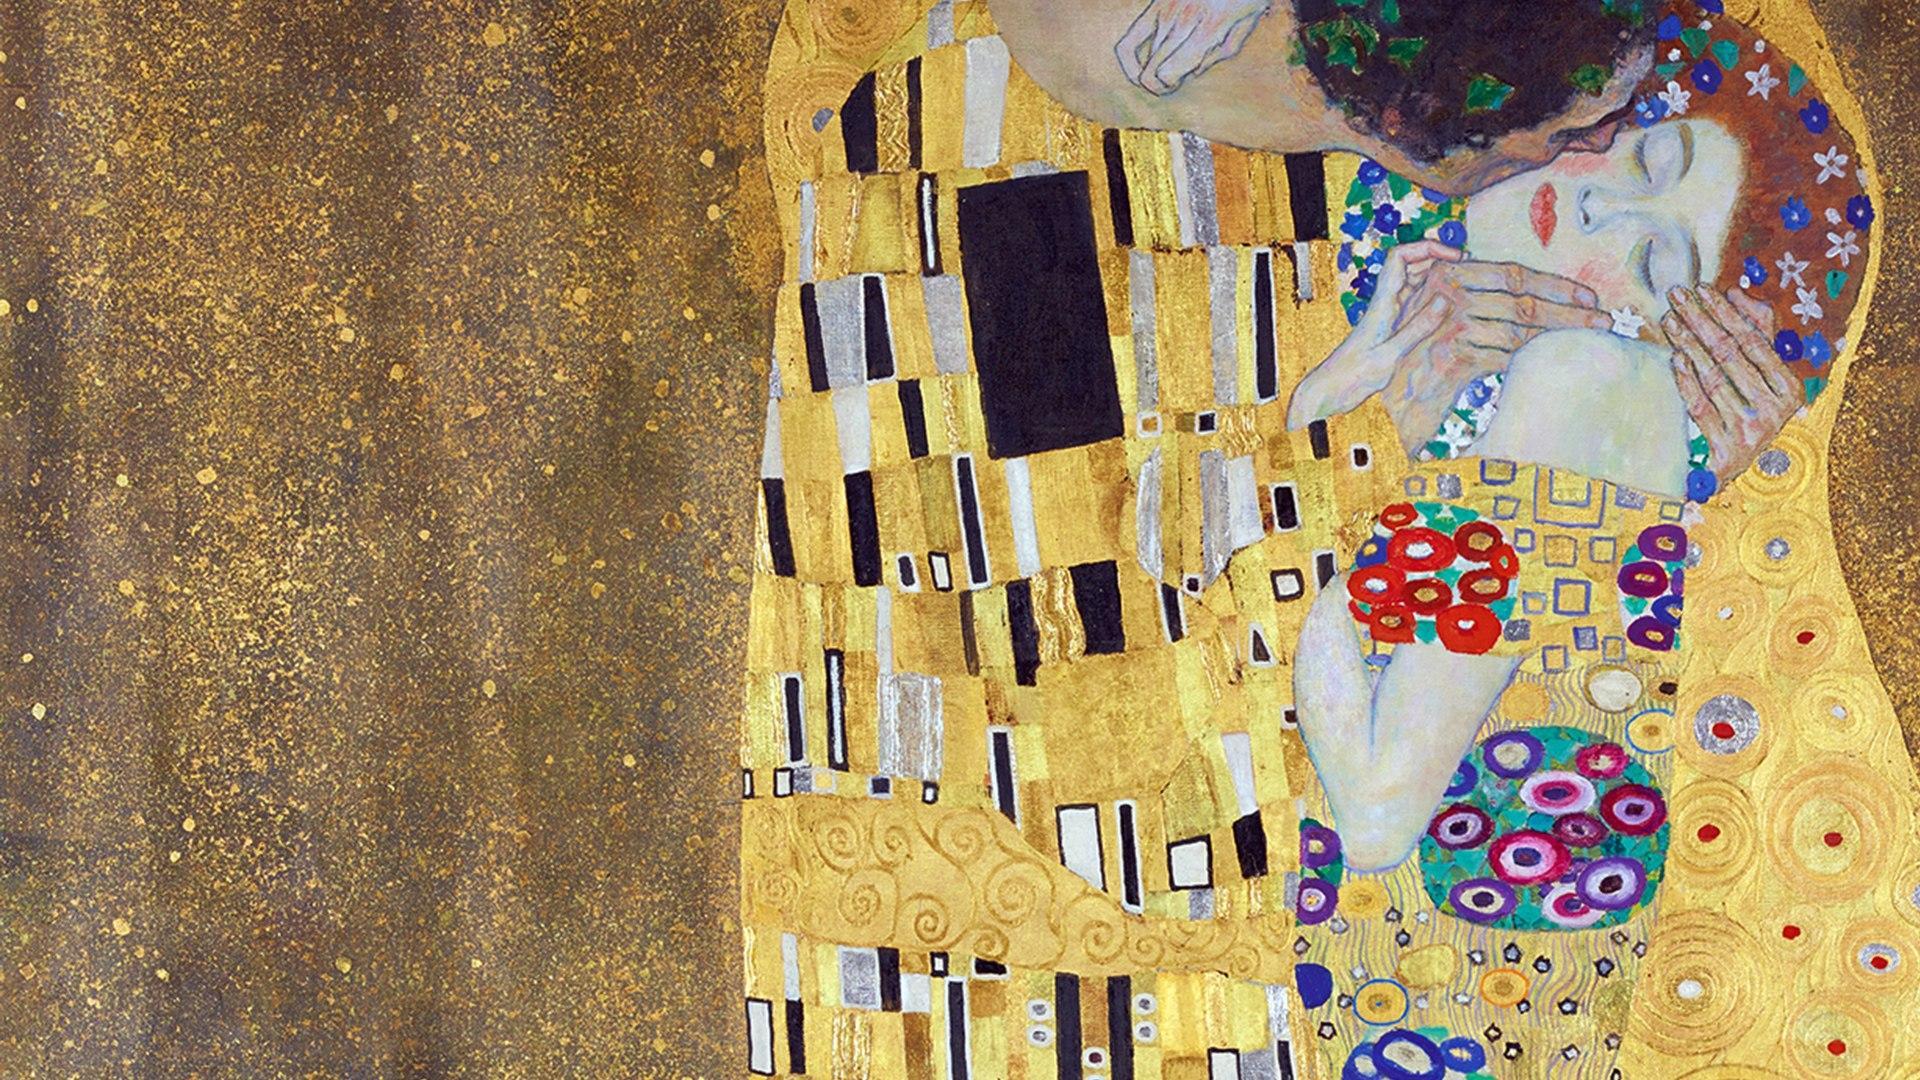 Sky Arte HD Klimt & Schiele - Eros e psiche